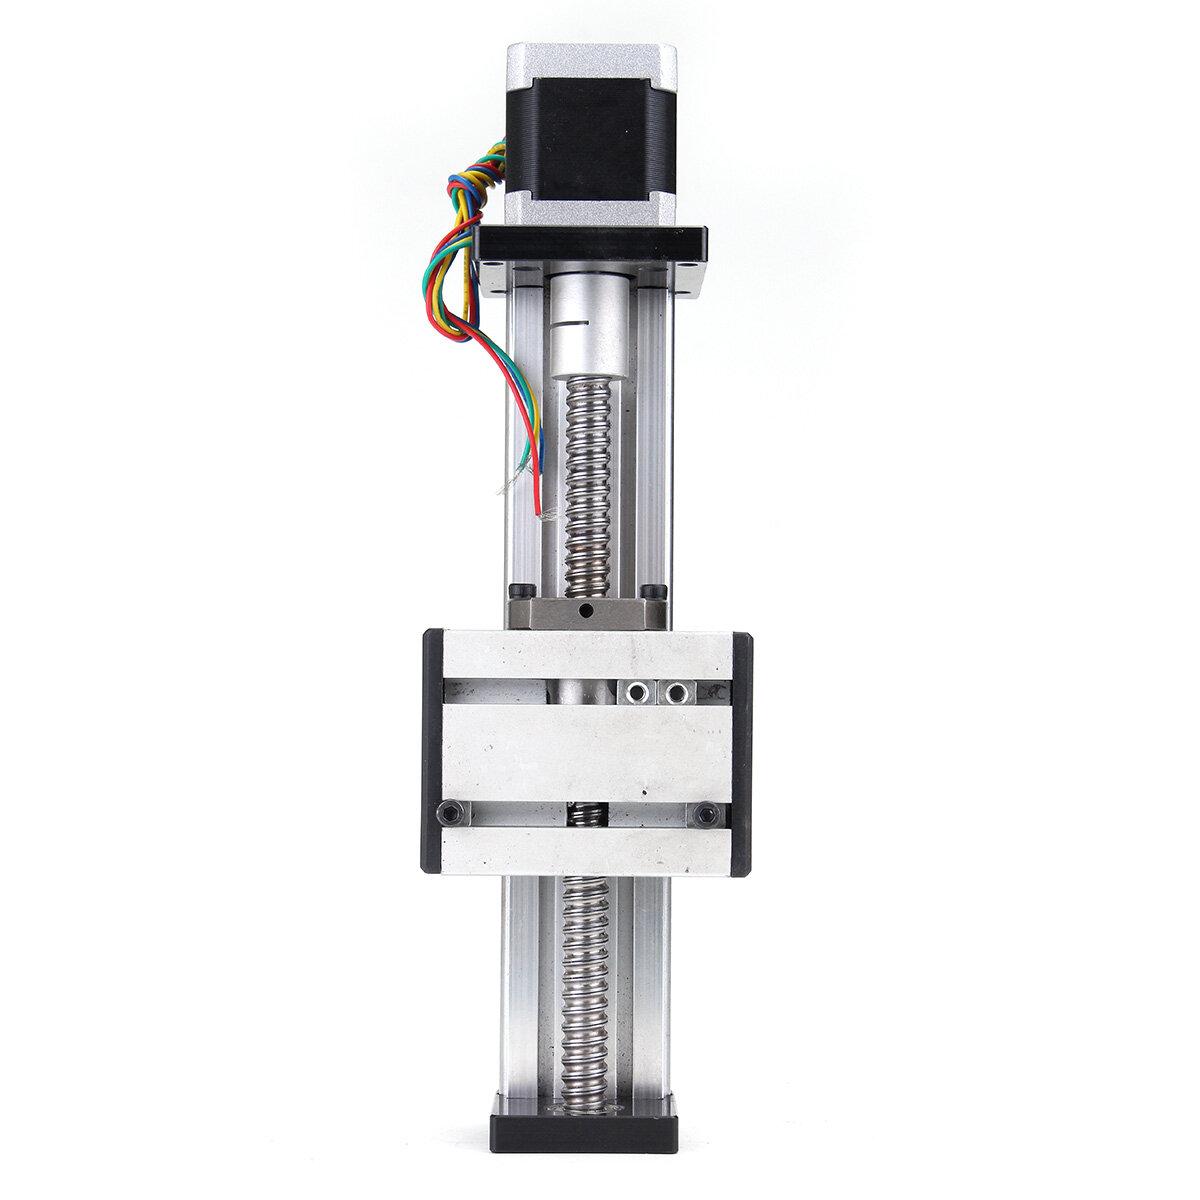 1204 Ball Screw Linear Slide Stroke Long Stage Actuator w// Stepper Motor 100mm R